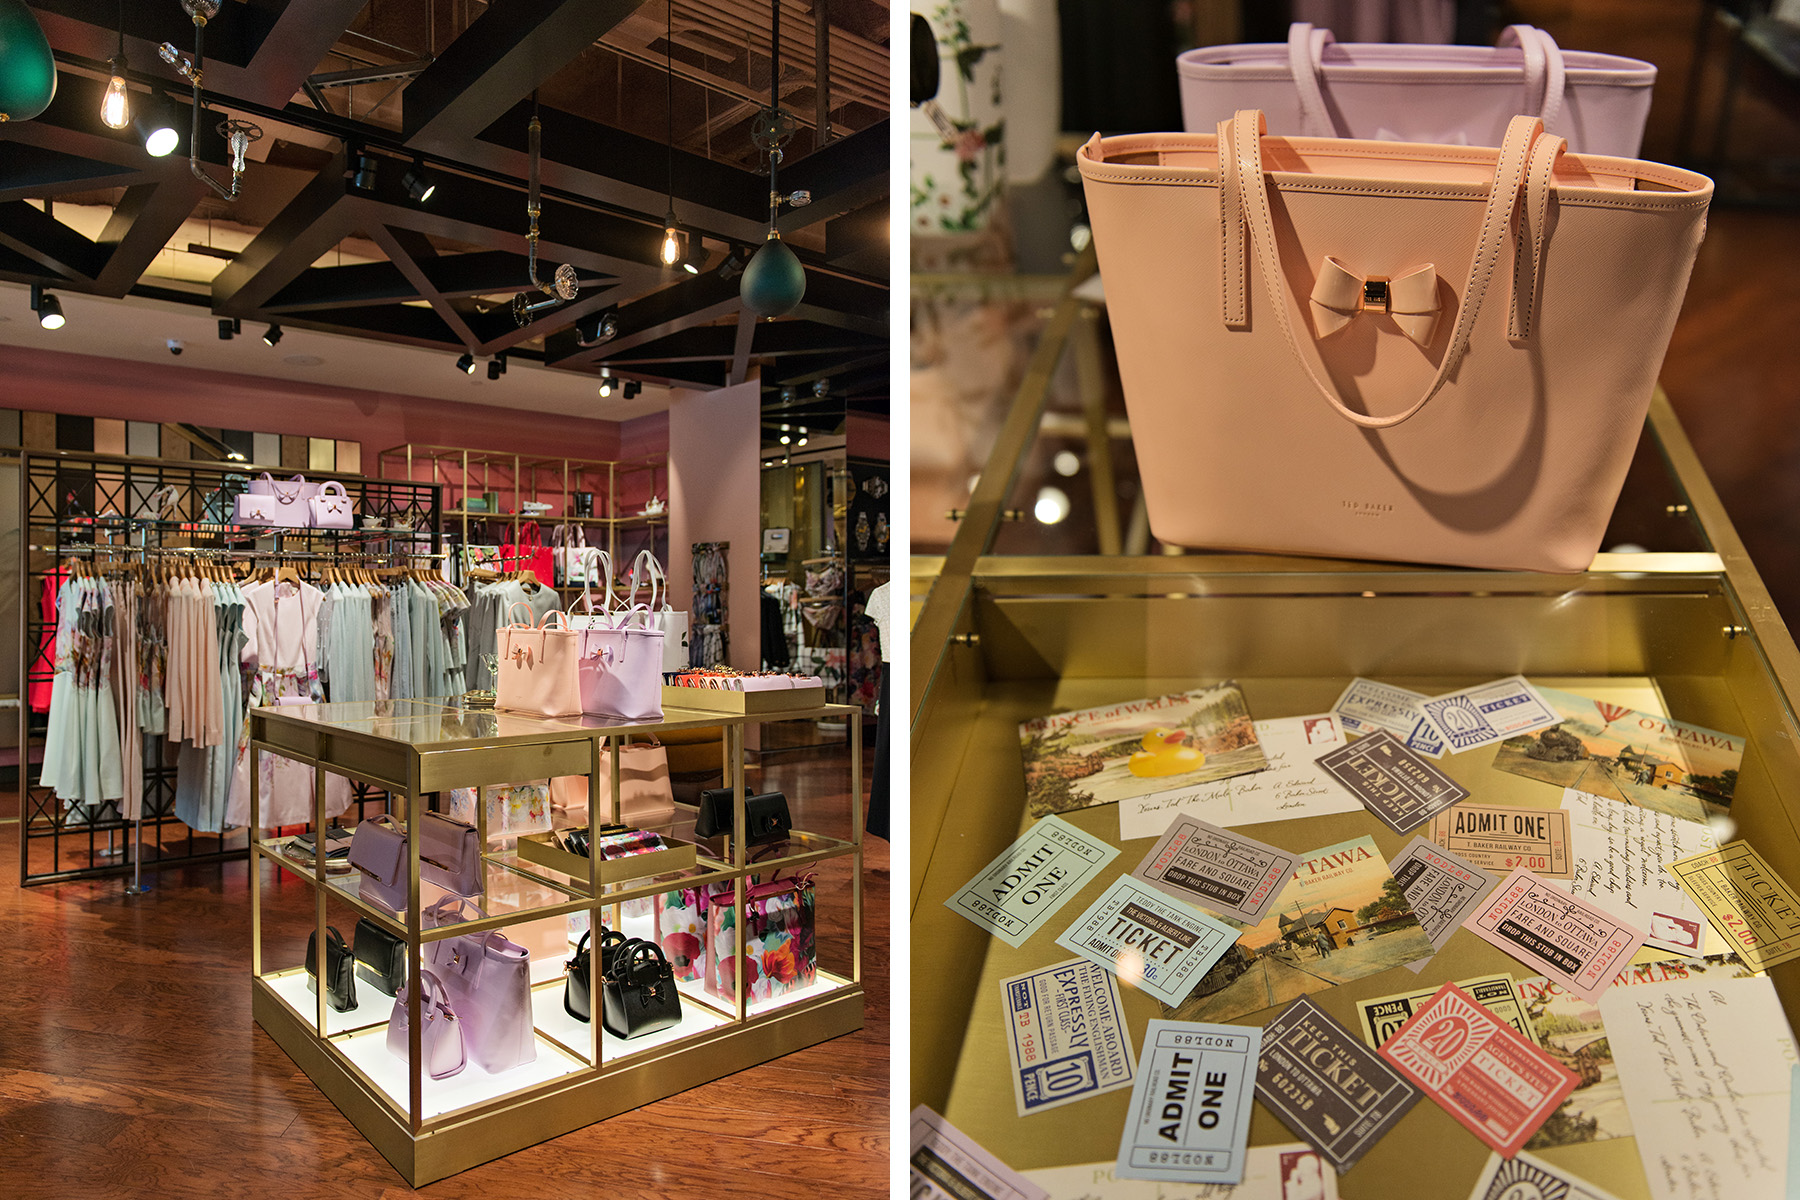 interior-retail-ted-baker-store-ottawa-004